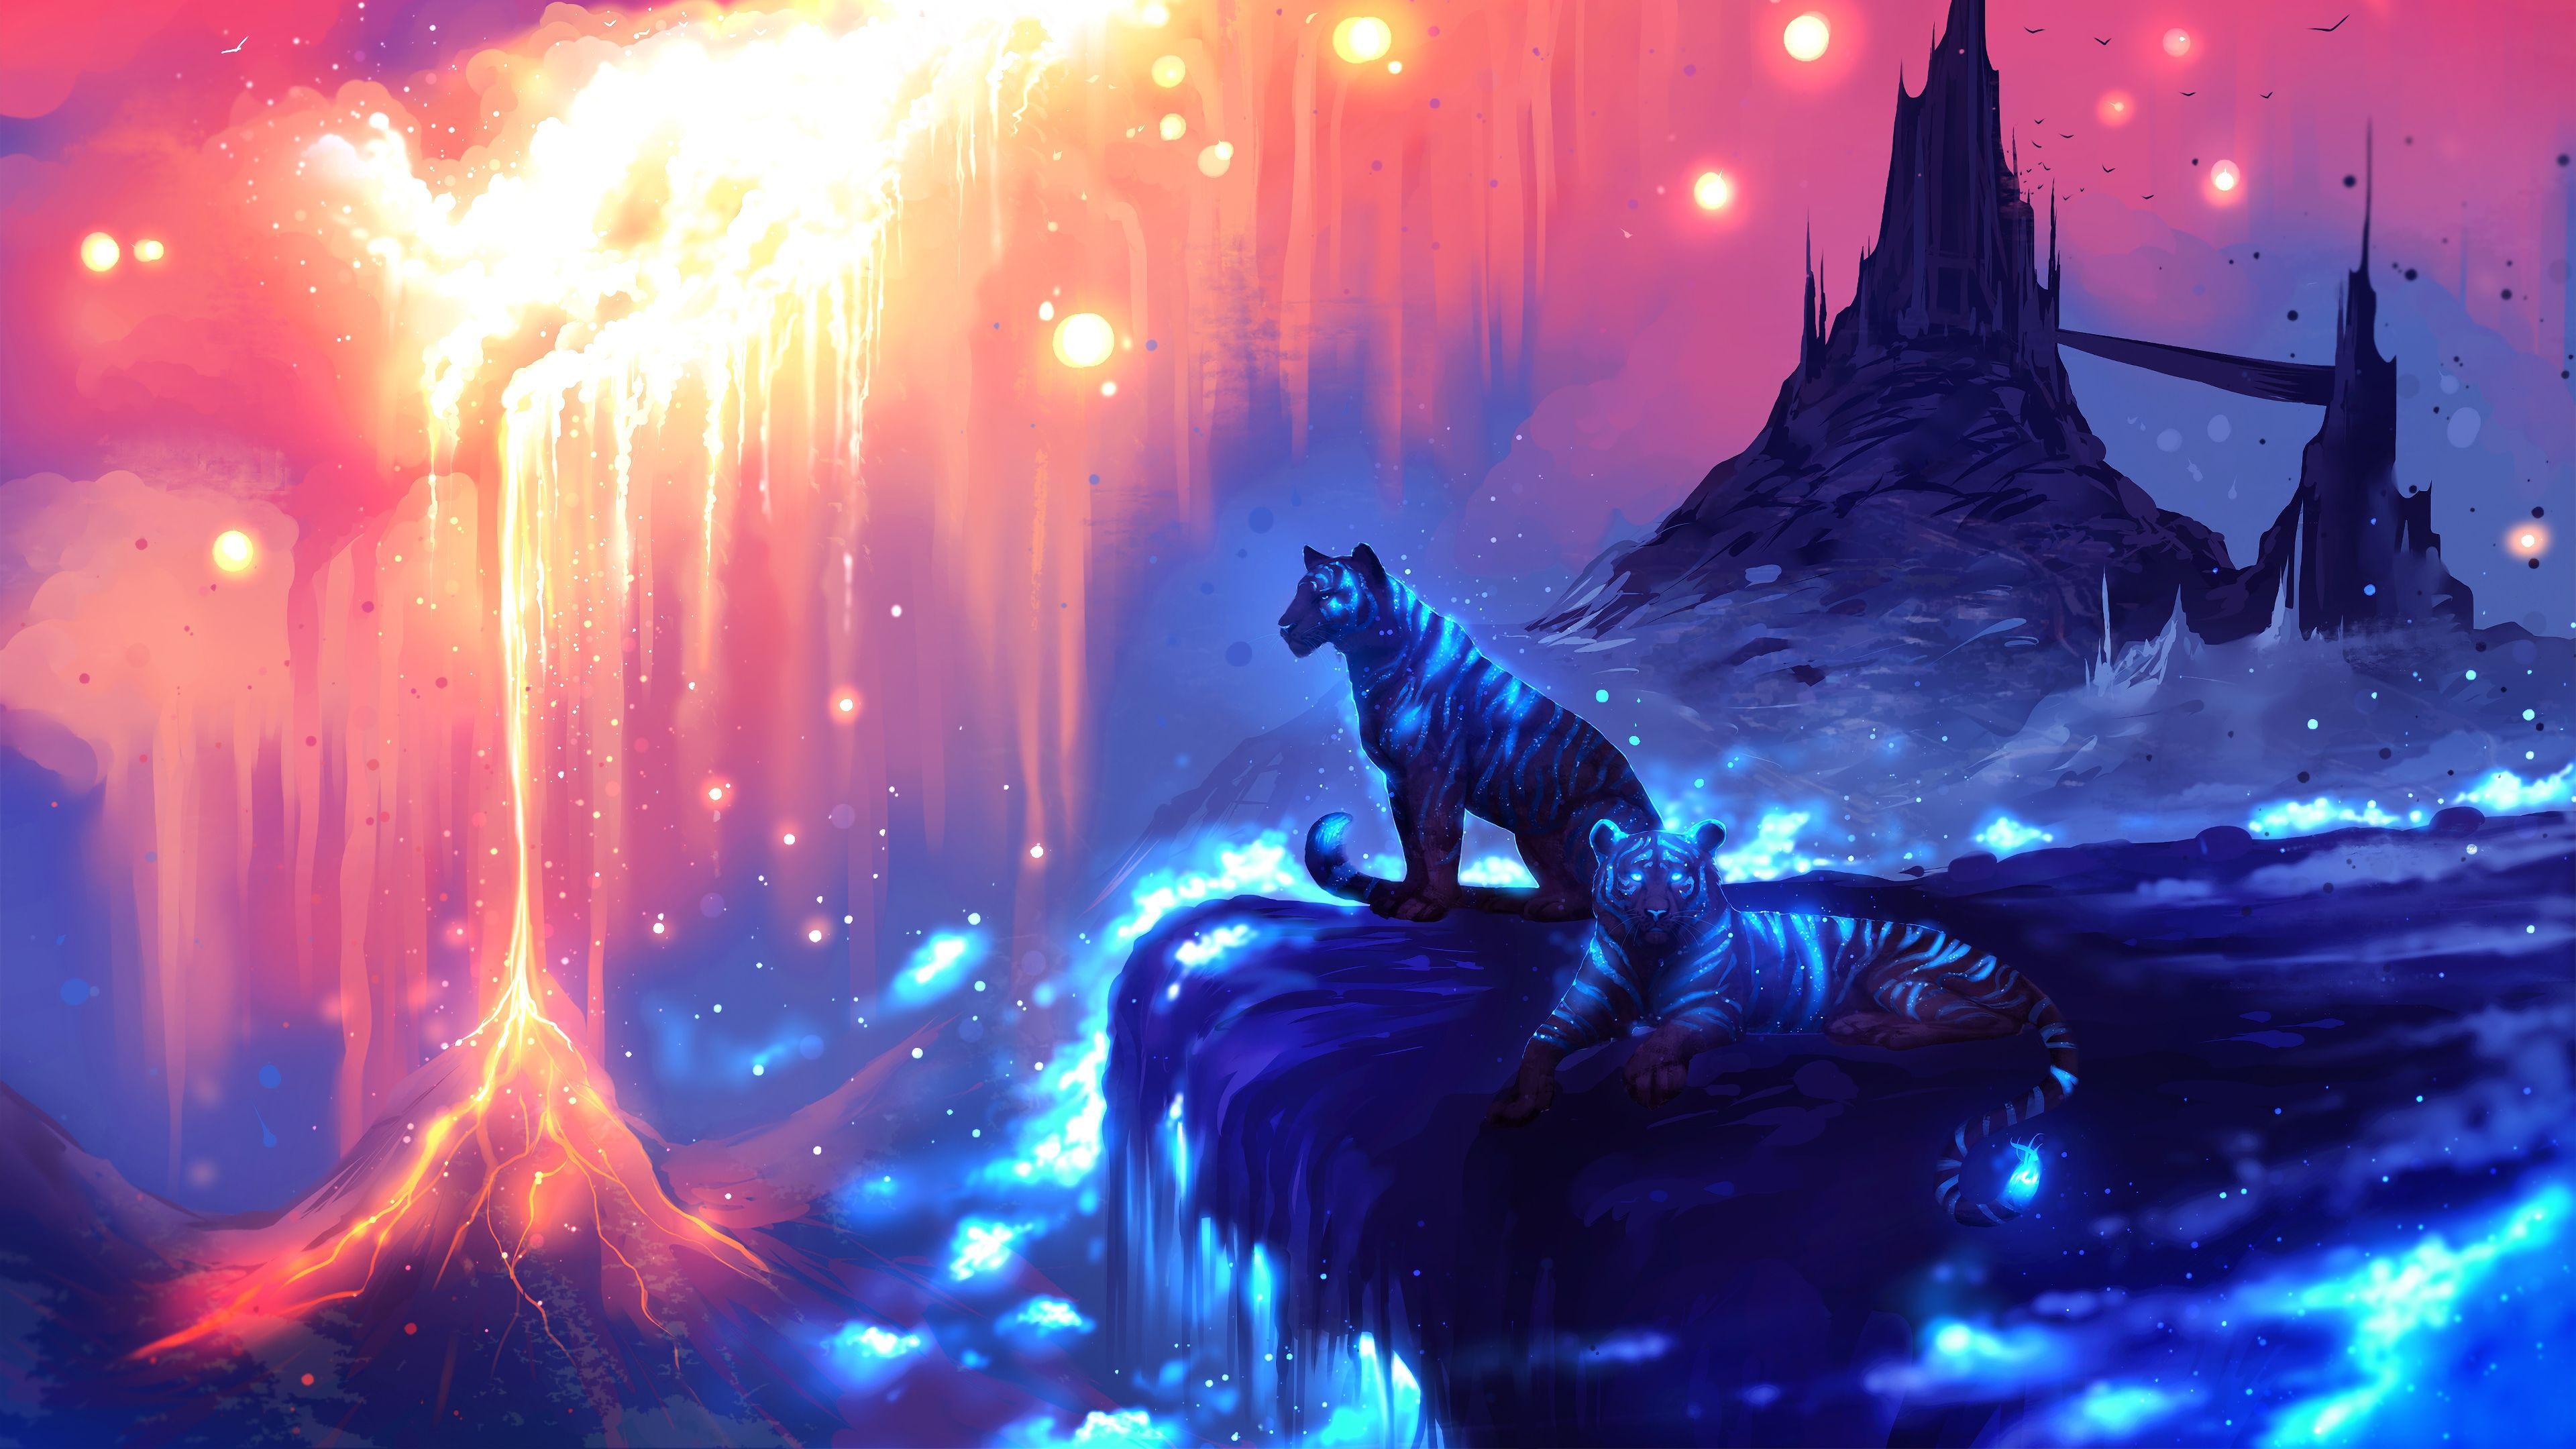 Tigers Fantasy Art 4K 2538 Fantasy landscape, Tiger art